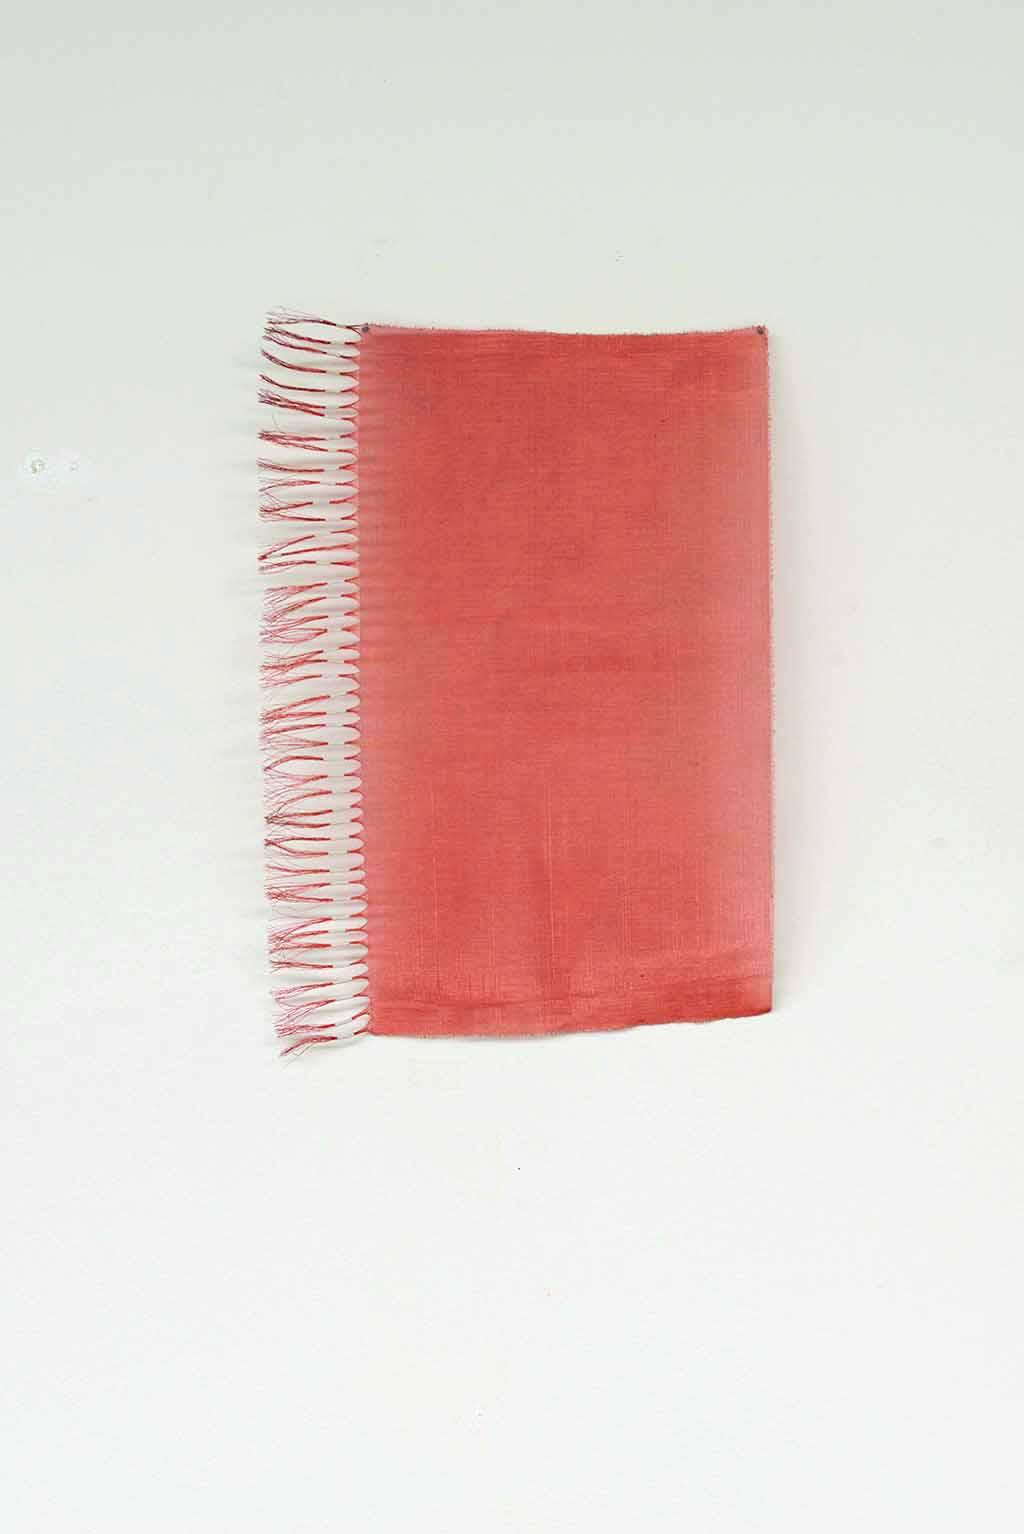 Copper mesh and shrink plastic. 31 x 21 x 2cm